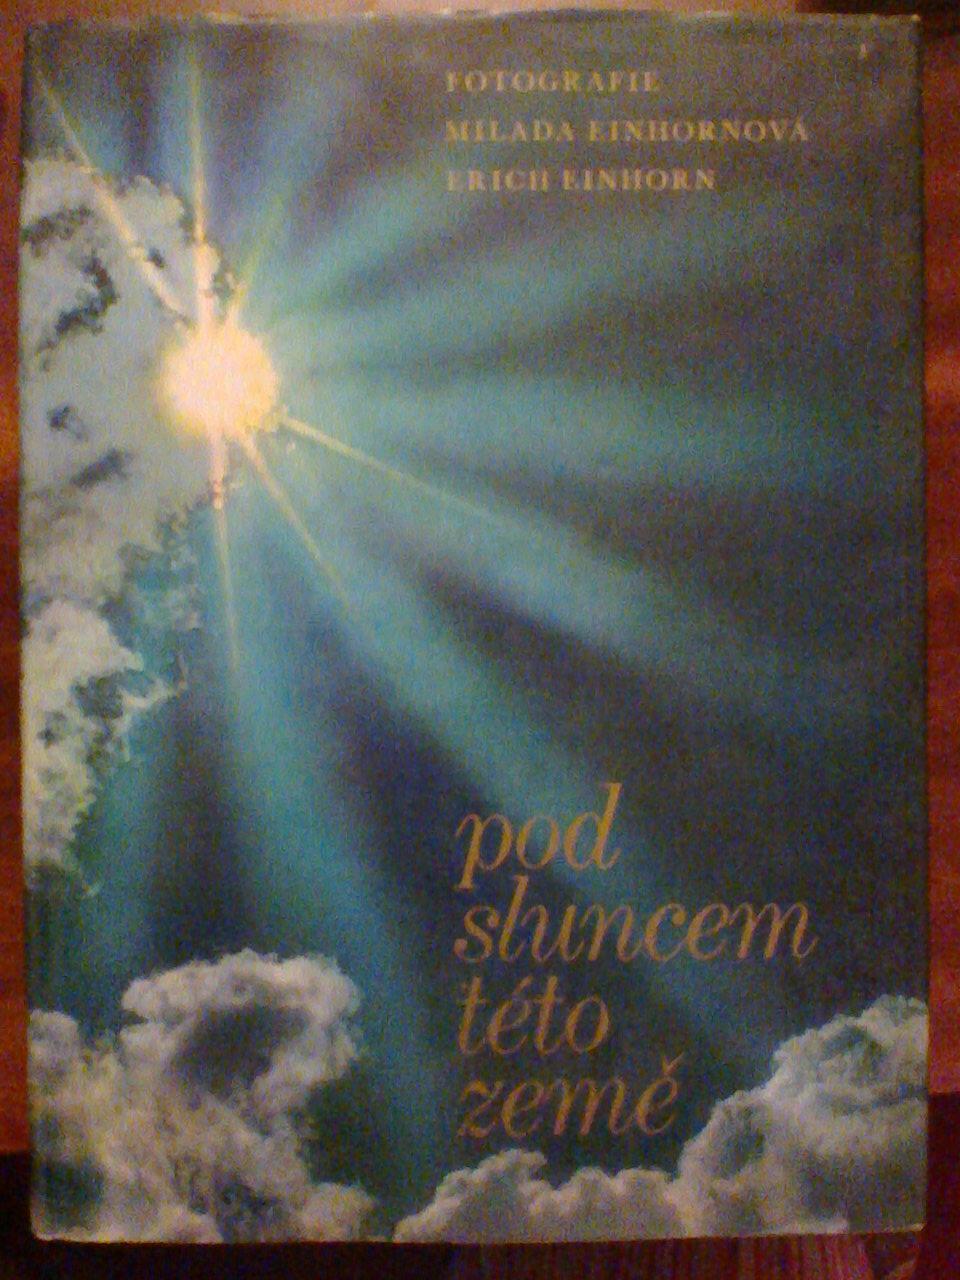 Pod sluncem této země - Milada Einhornová, Erich Einhorn